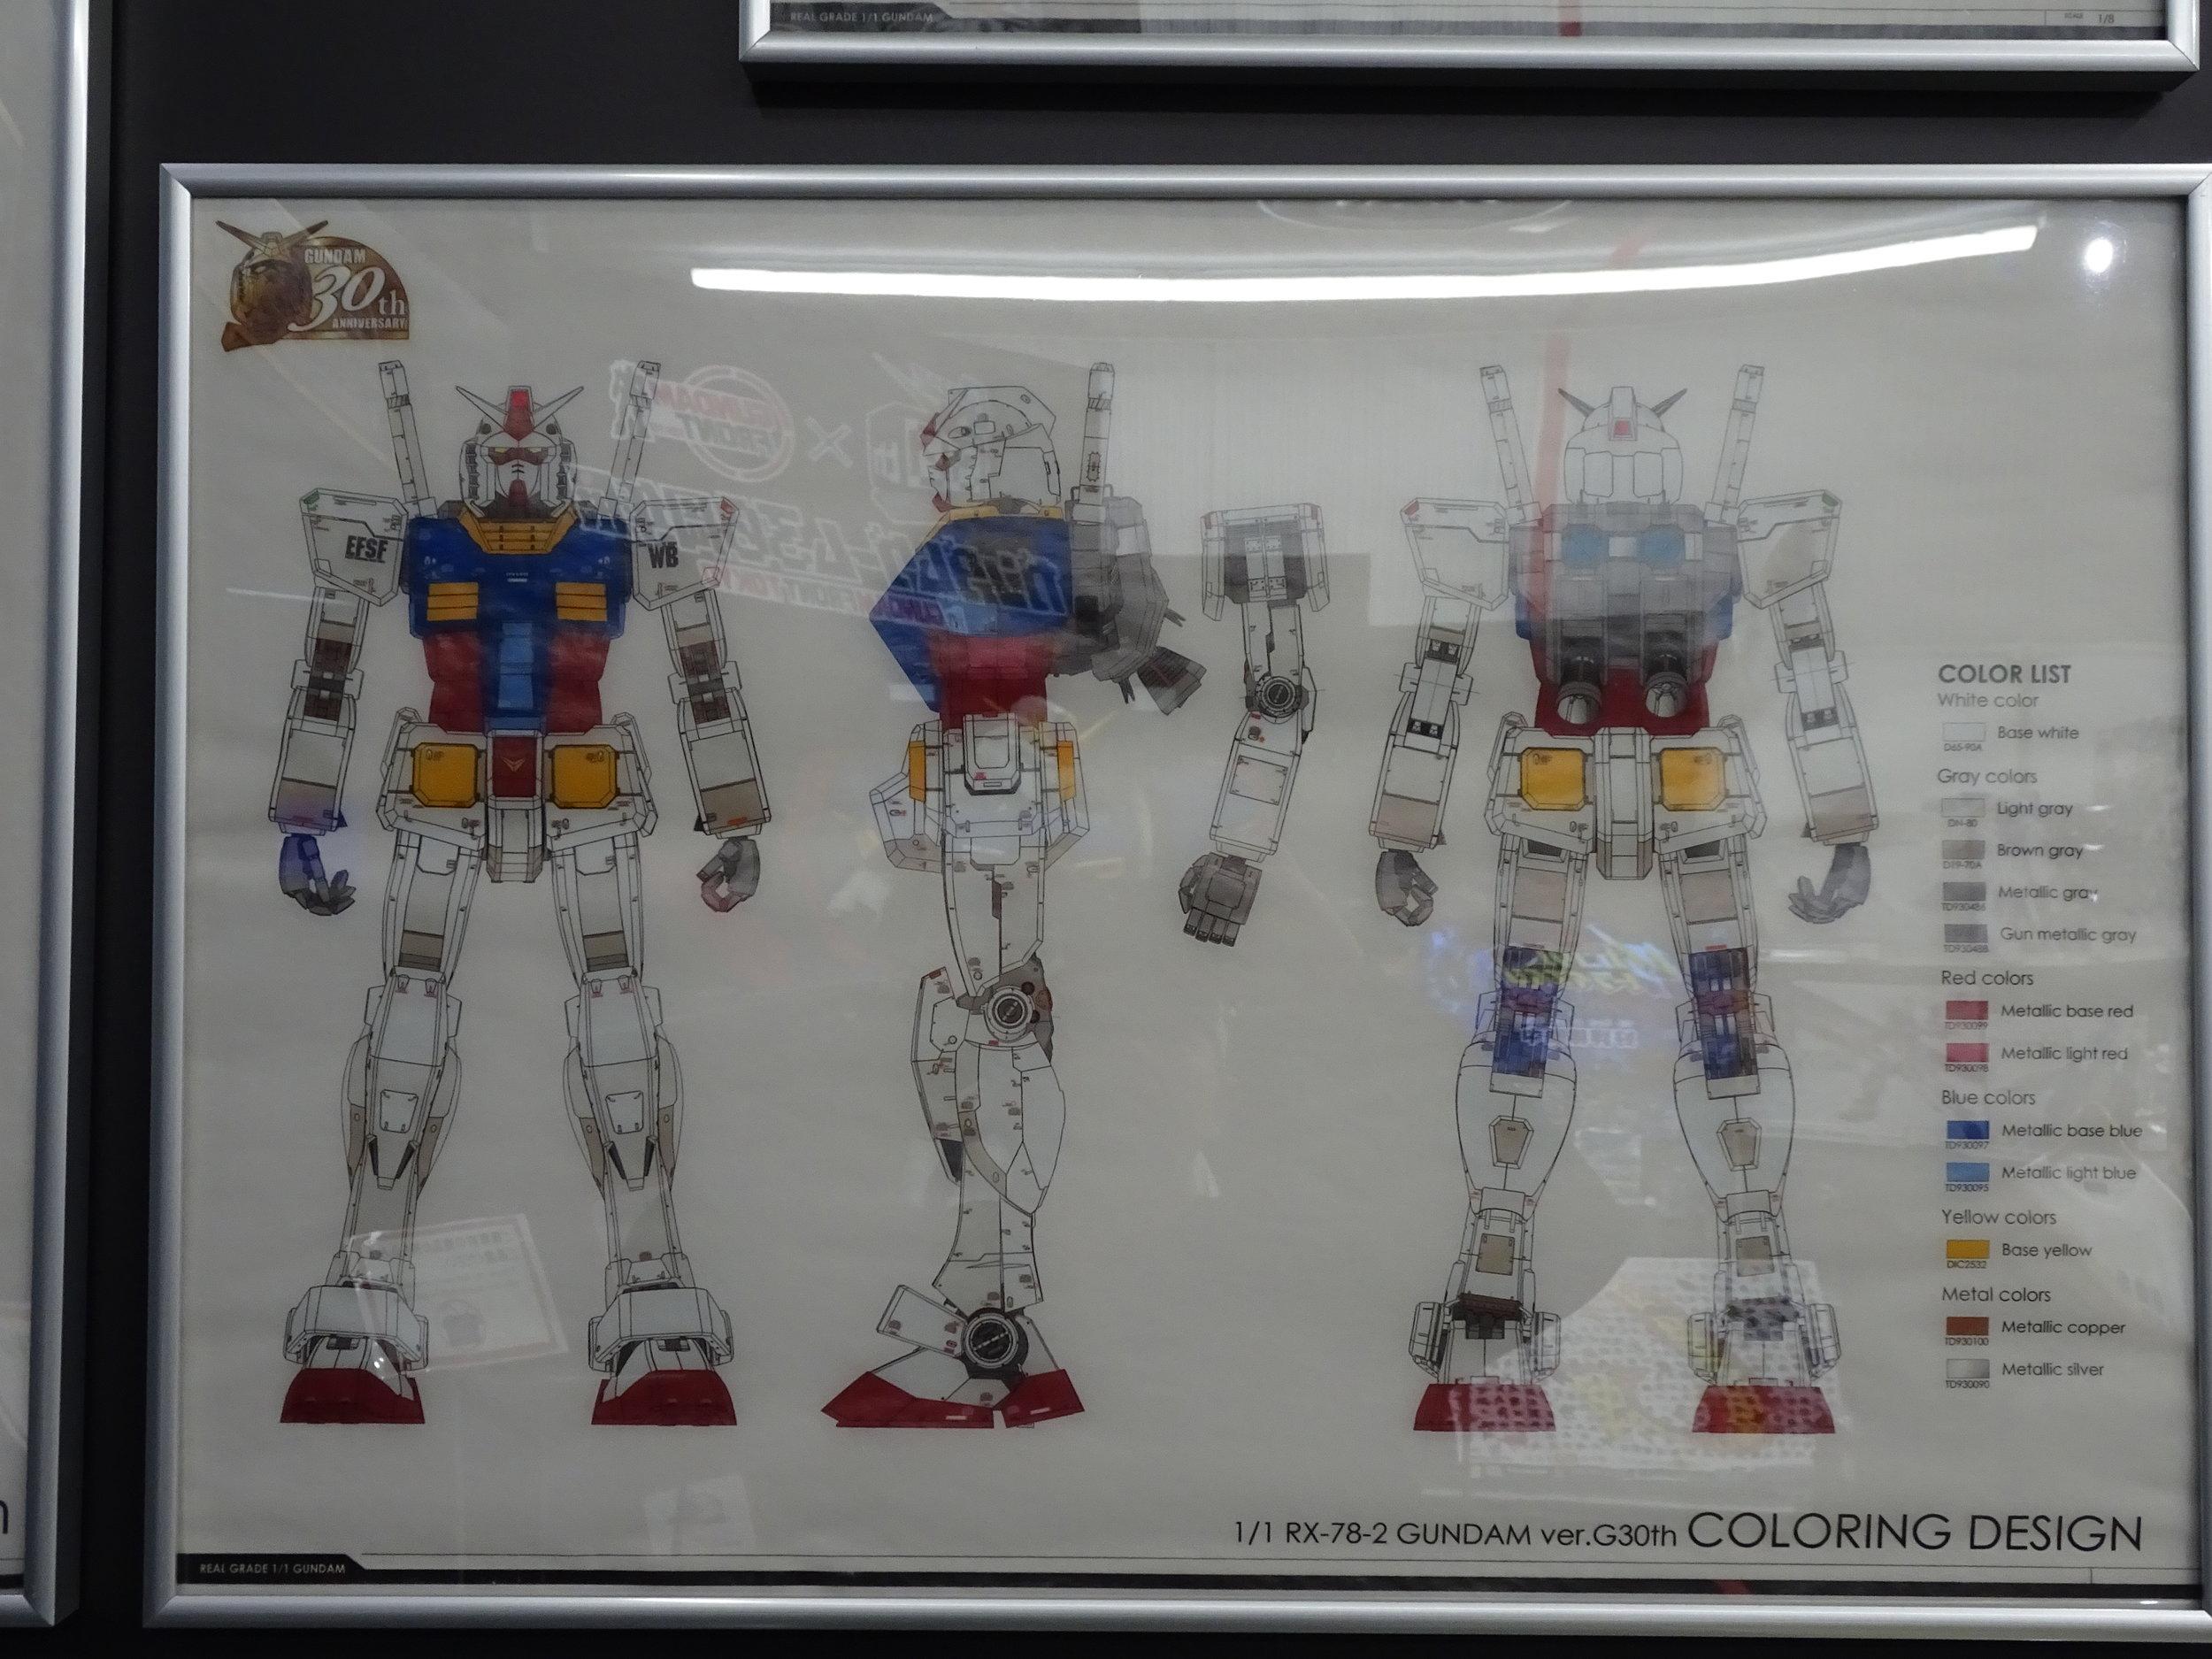 RX-78-2 Gundam 1-1 Statue - 116.jpg